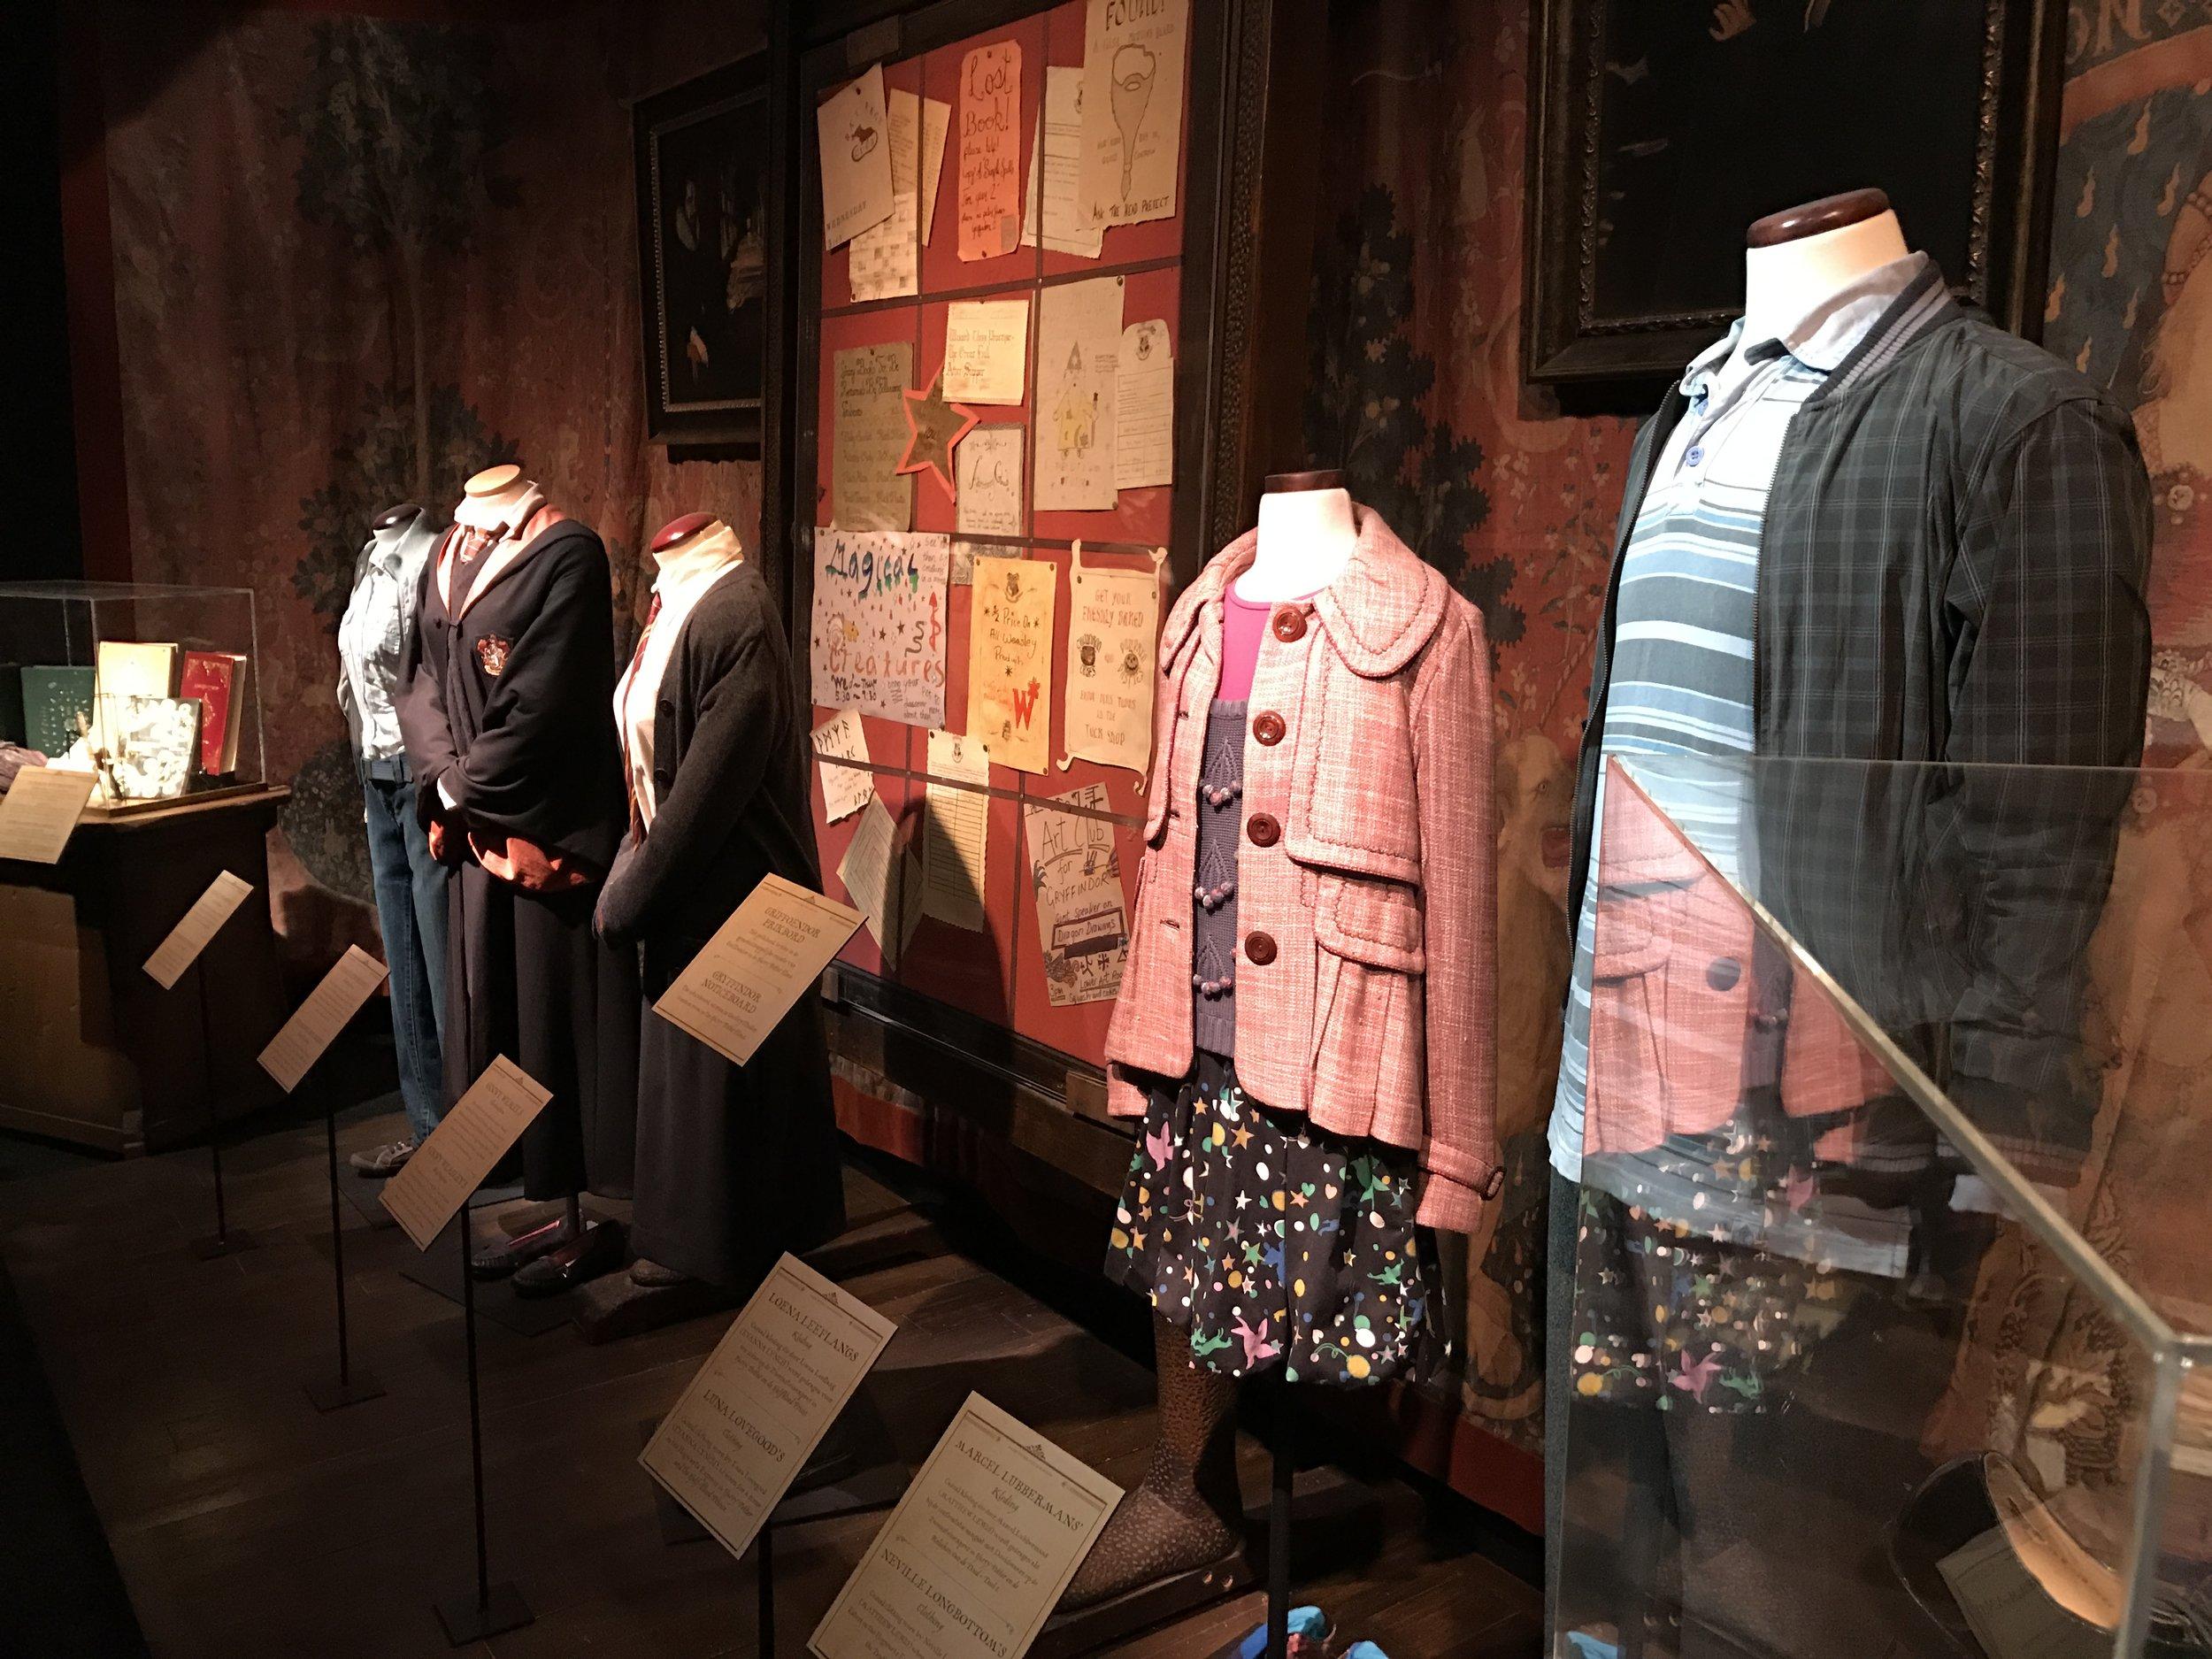 Harry Potter Expo, De Museumpodcast